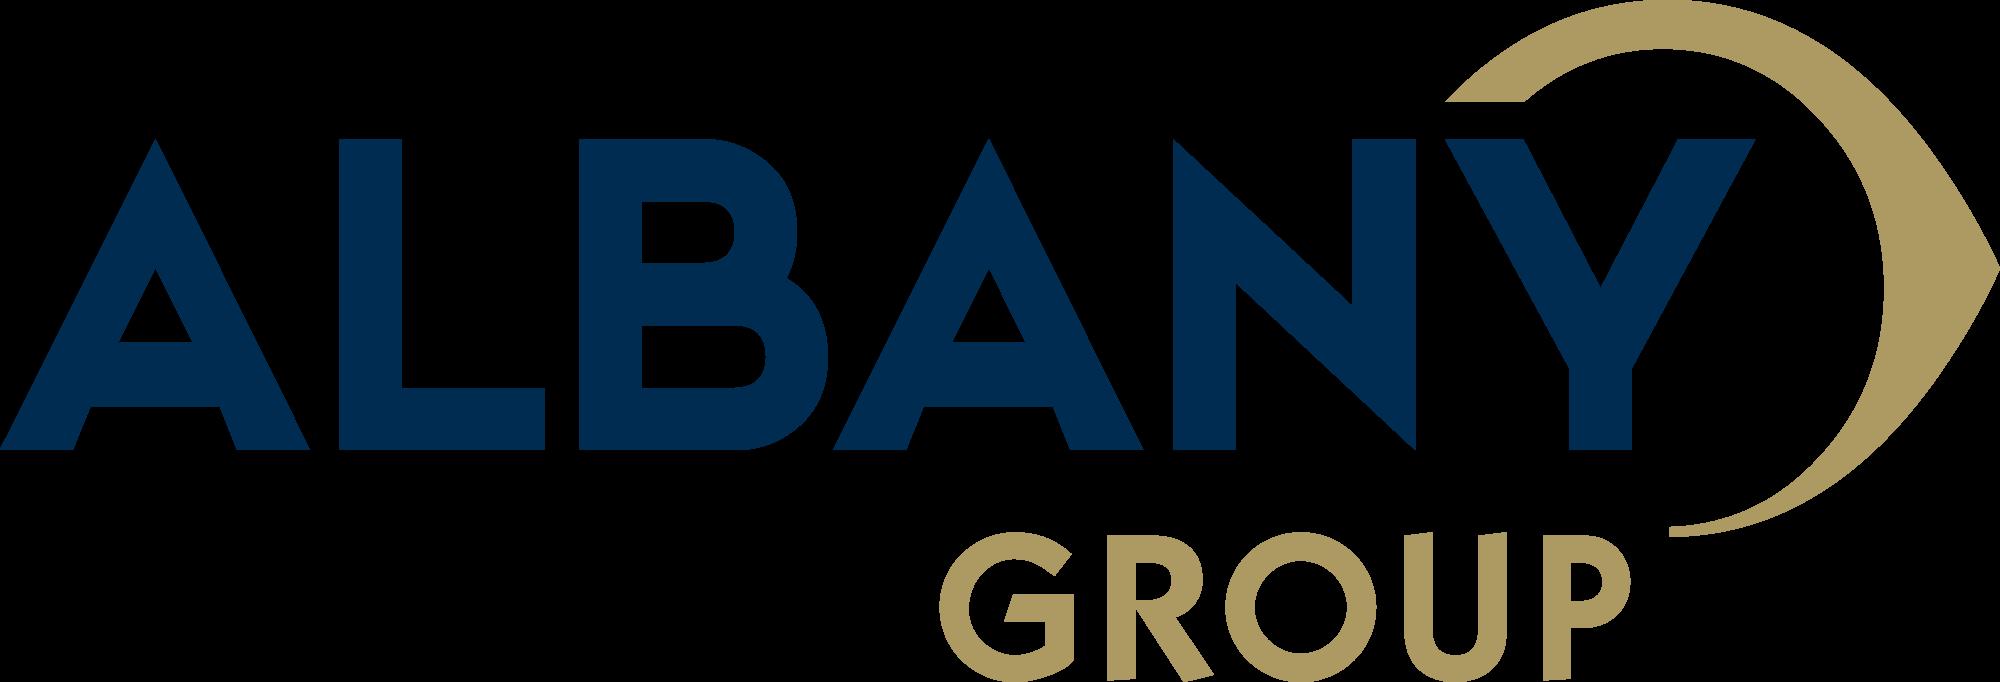 Albany Group's RegTech Hot Shop Announces Partnership with Sapiens to Simplify Regulatory Compliance